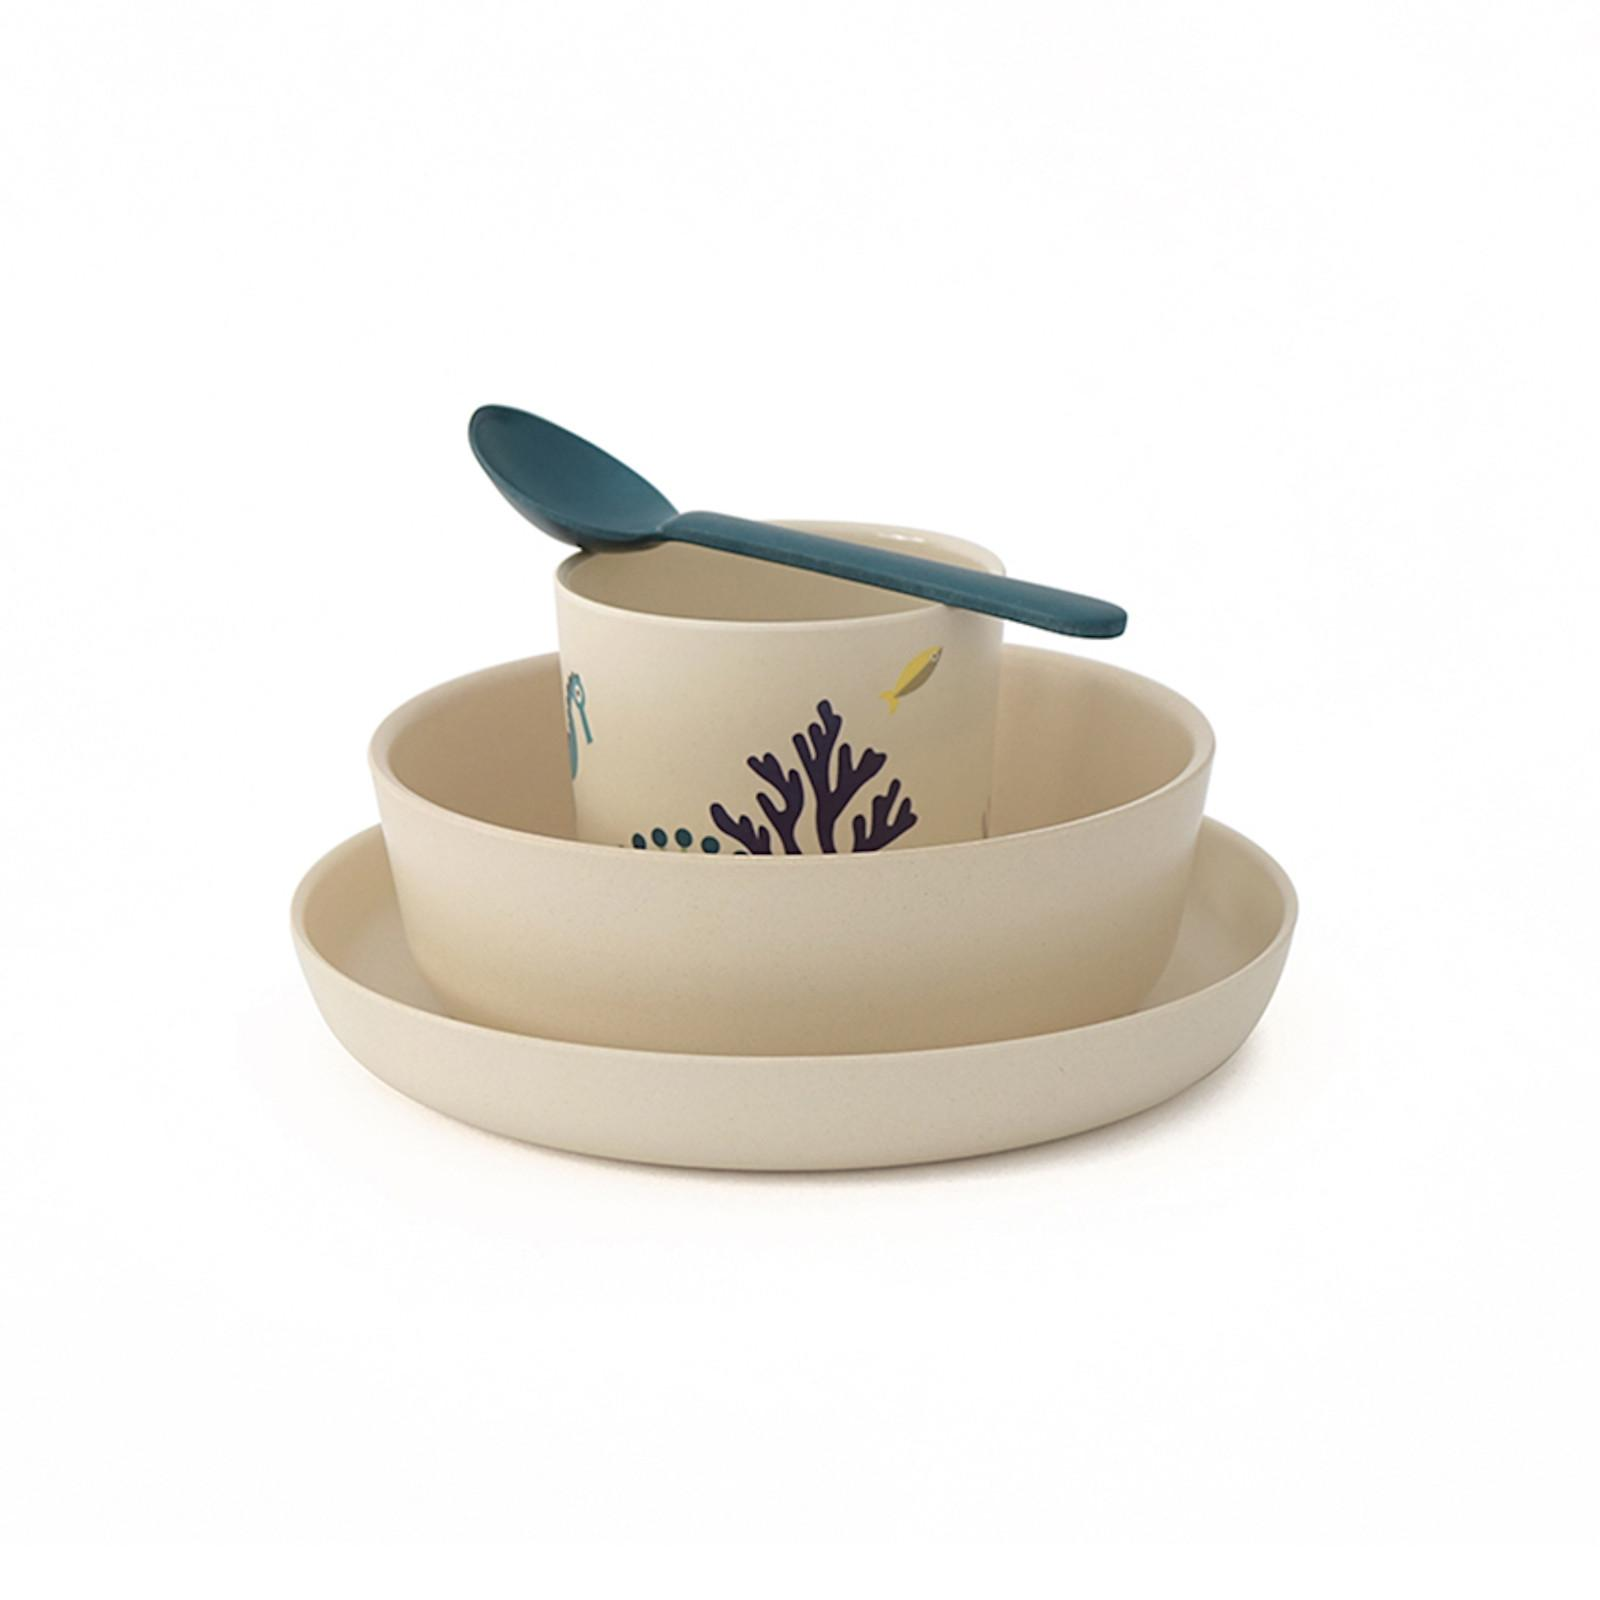 EKOBO Bamboo Kid Set SEAS dětská sada nádobí 4 ks